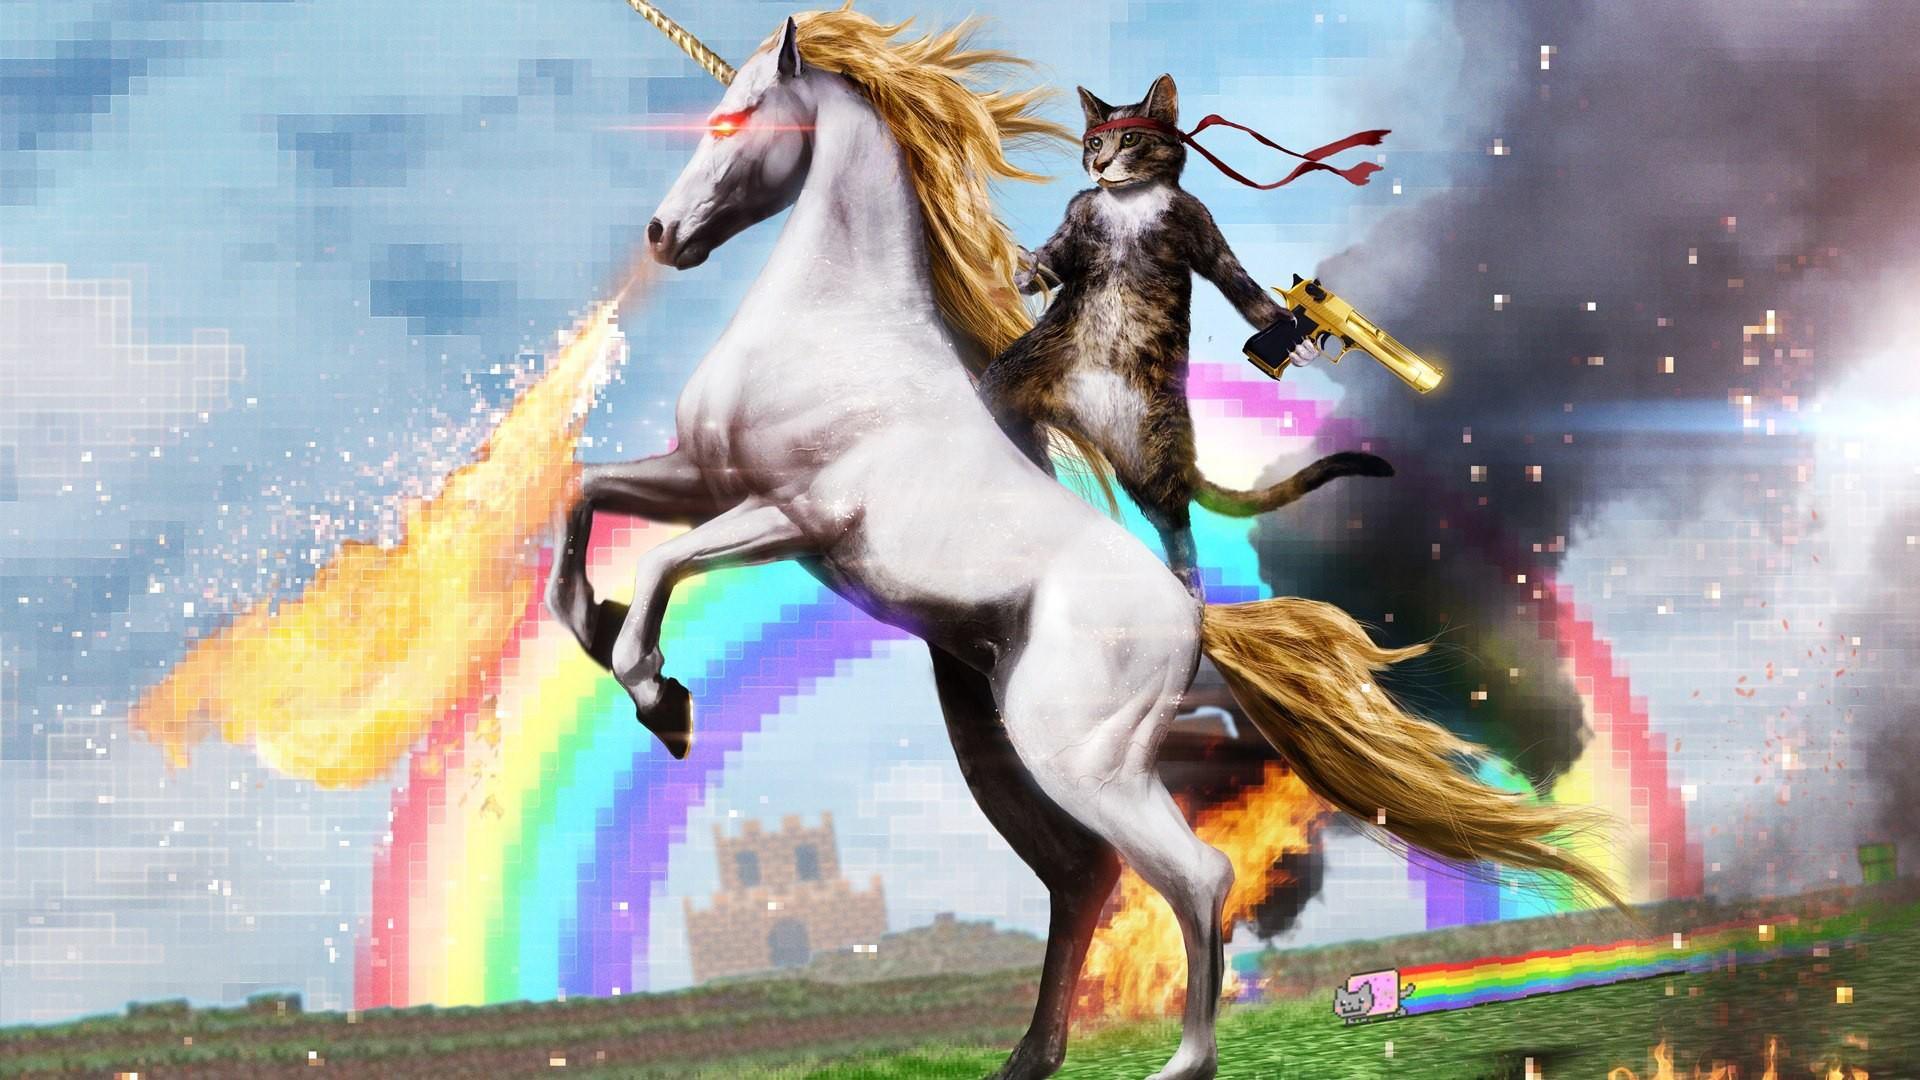 Simple Wallpaper Horse Laptop - tumblr_static_trippy_kitty  Snapshot_626863.jpg